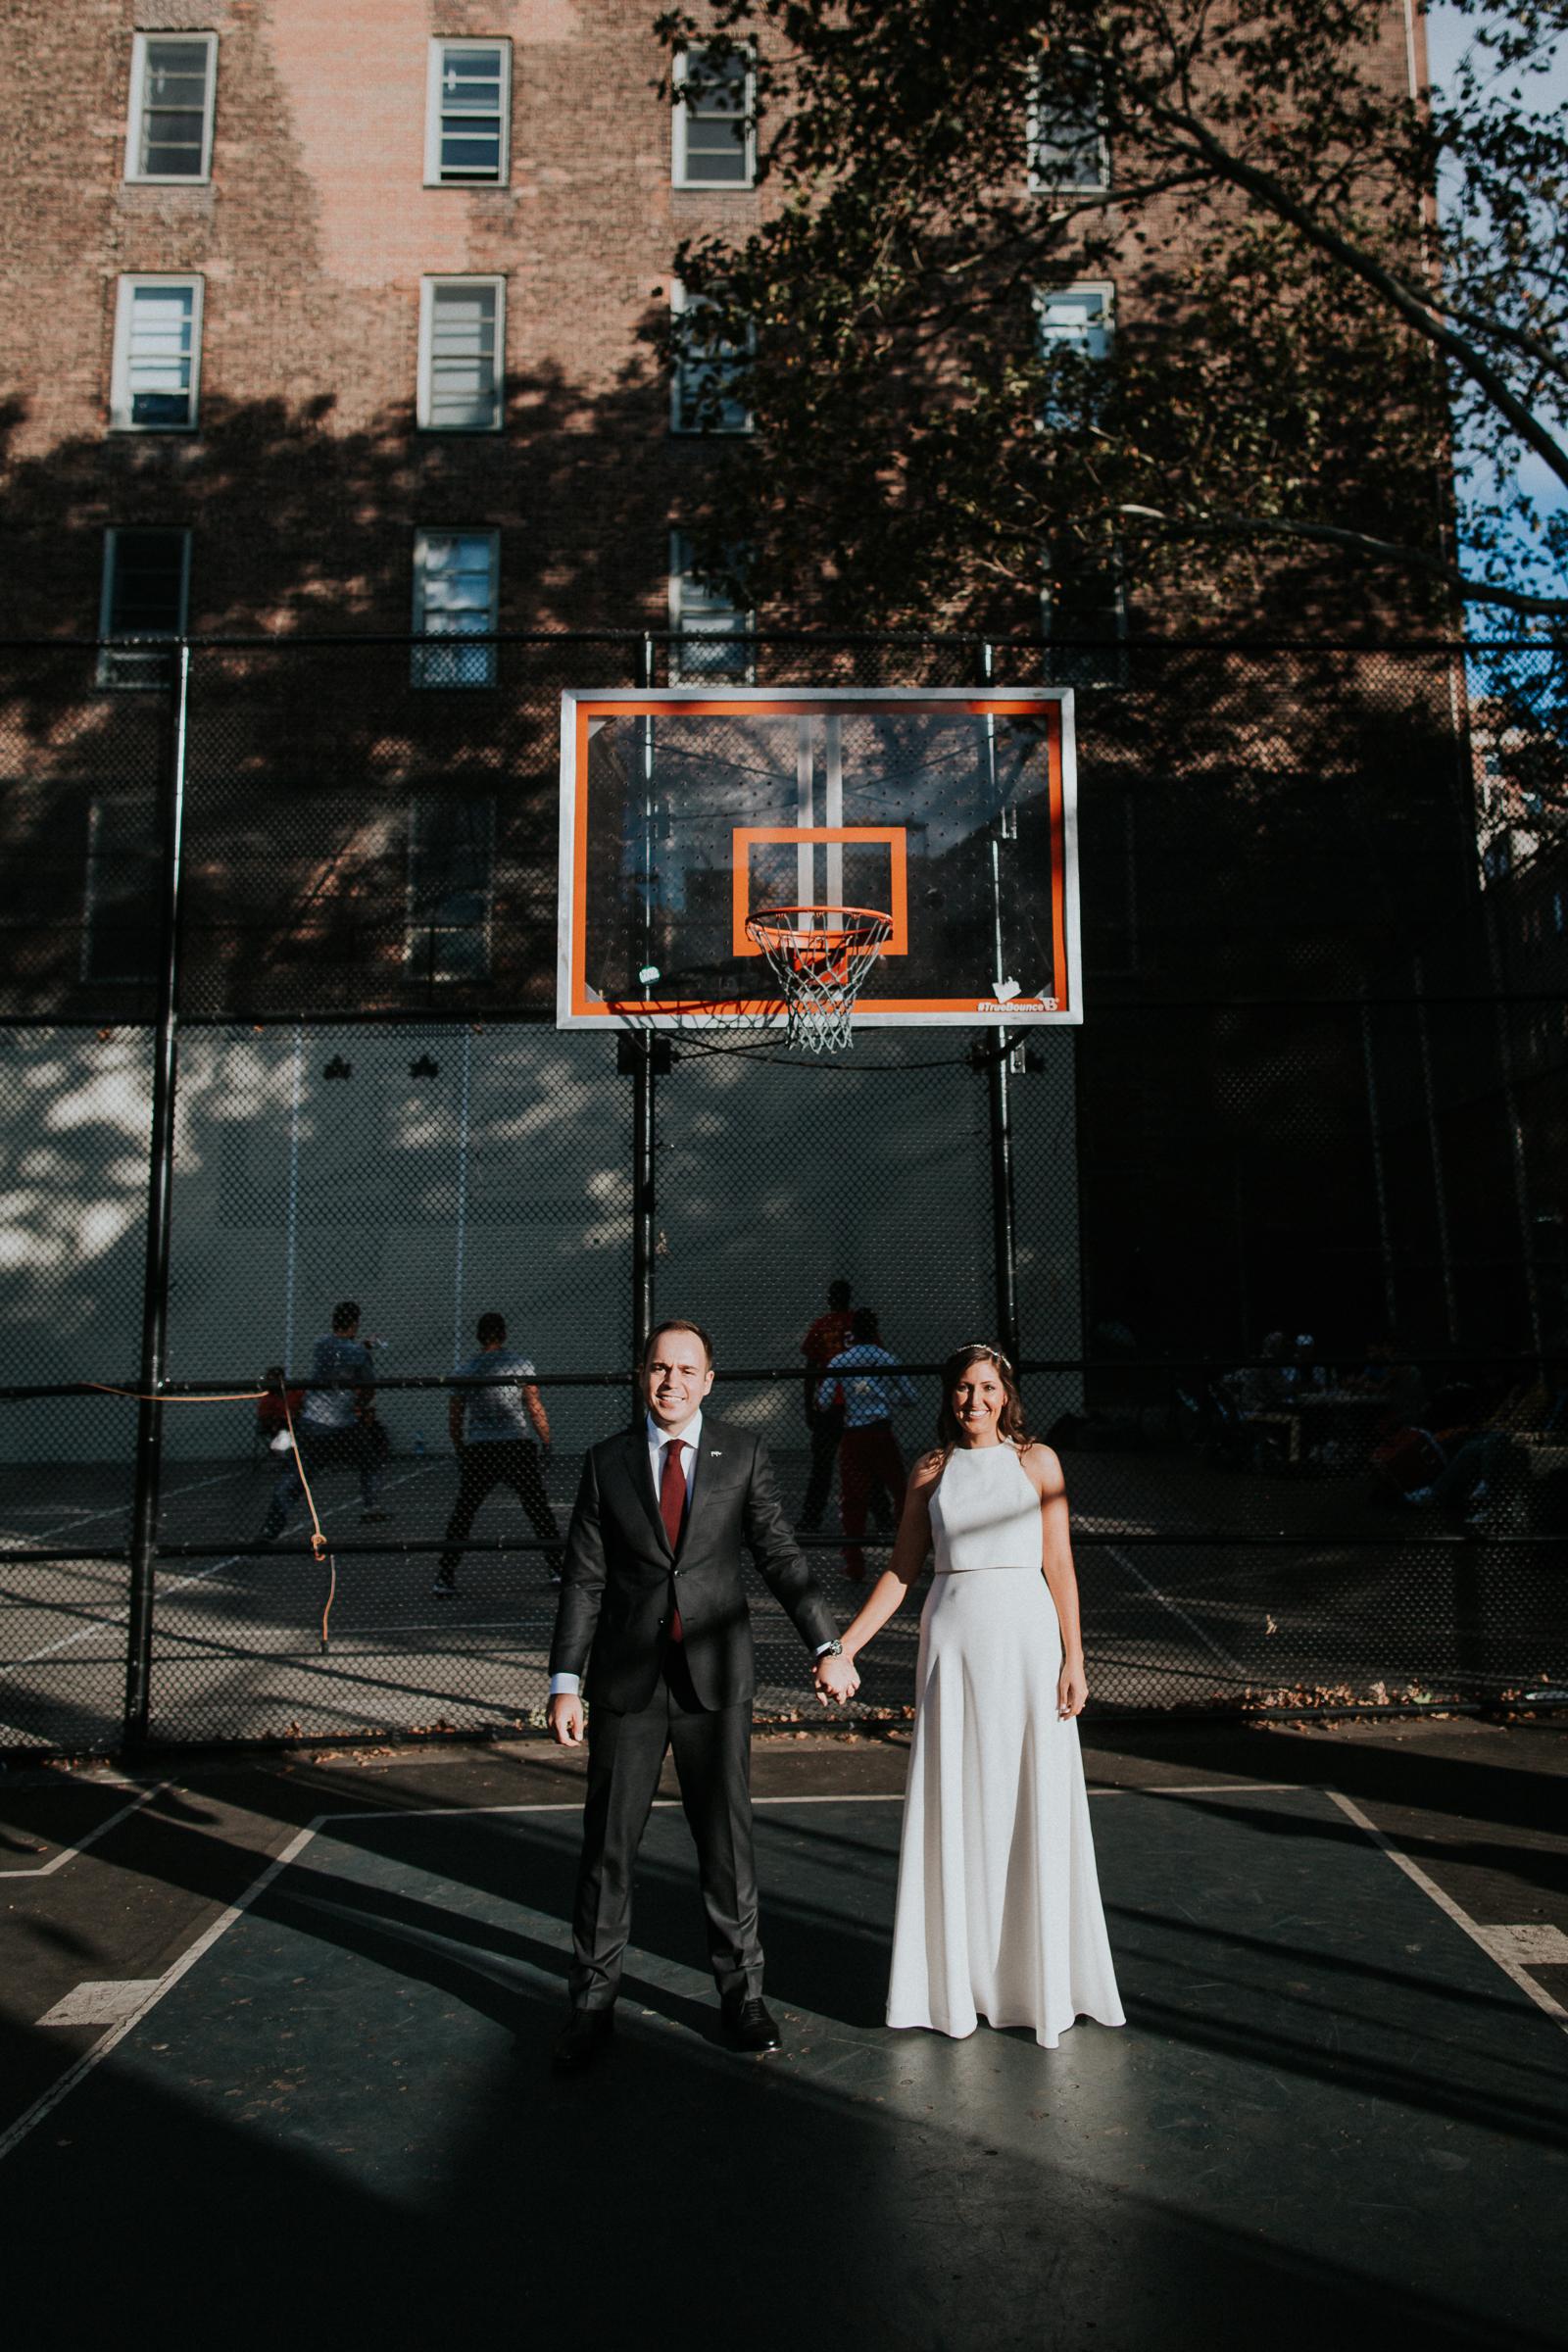 Casa-Apicii-Intimate-Wedding-City-Hall-Elopement-New-York-Documentary-Wedding-Photographer-31.jpg